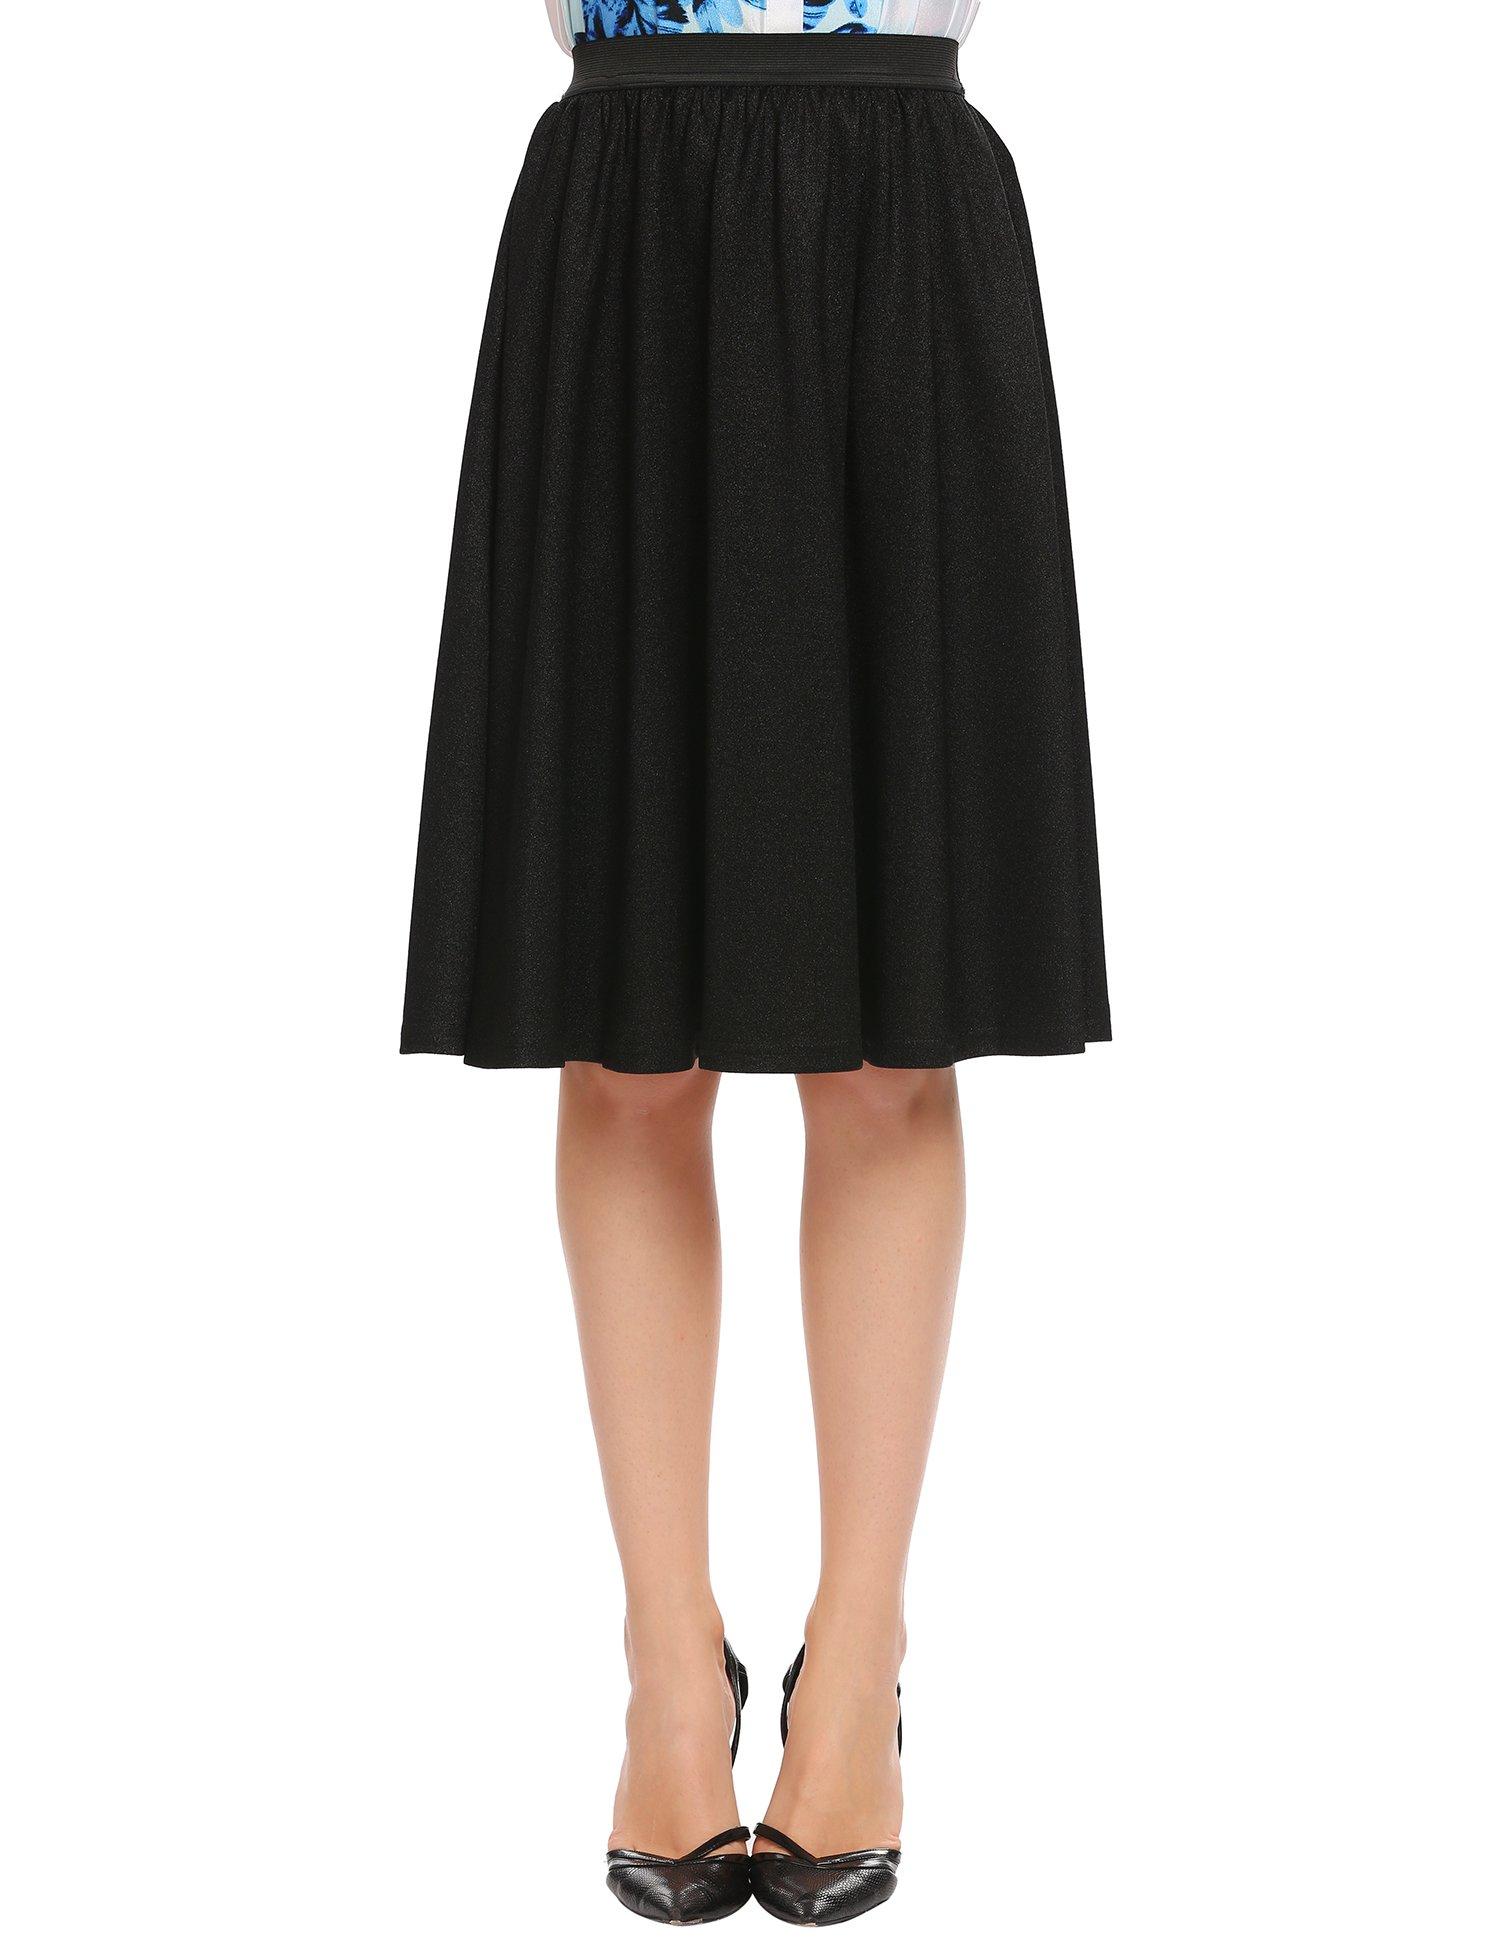 Zeagoo Women's High Waist Midi Long Pleated Skirt,Black,Medium